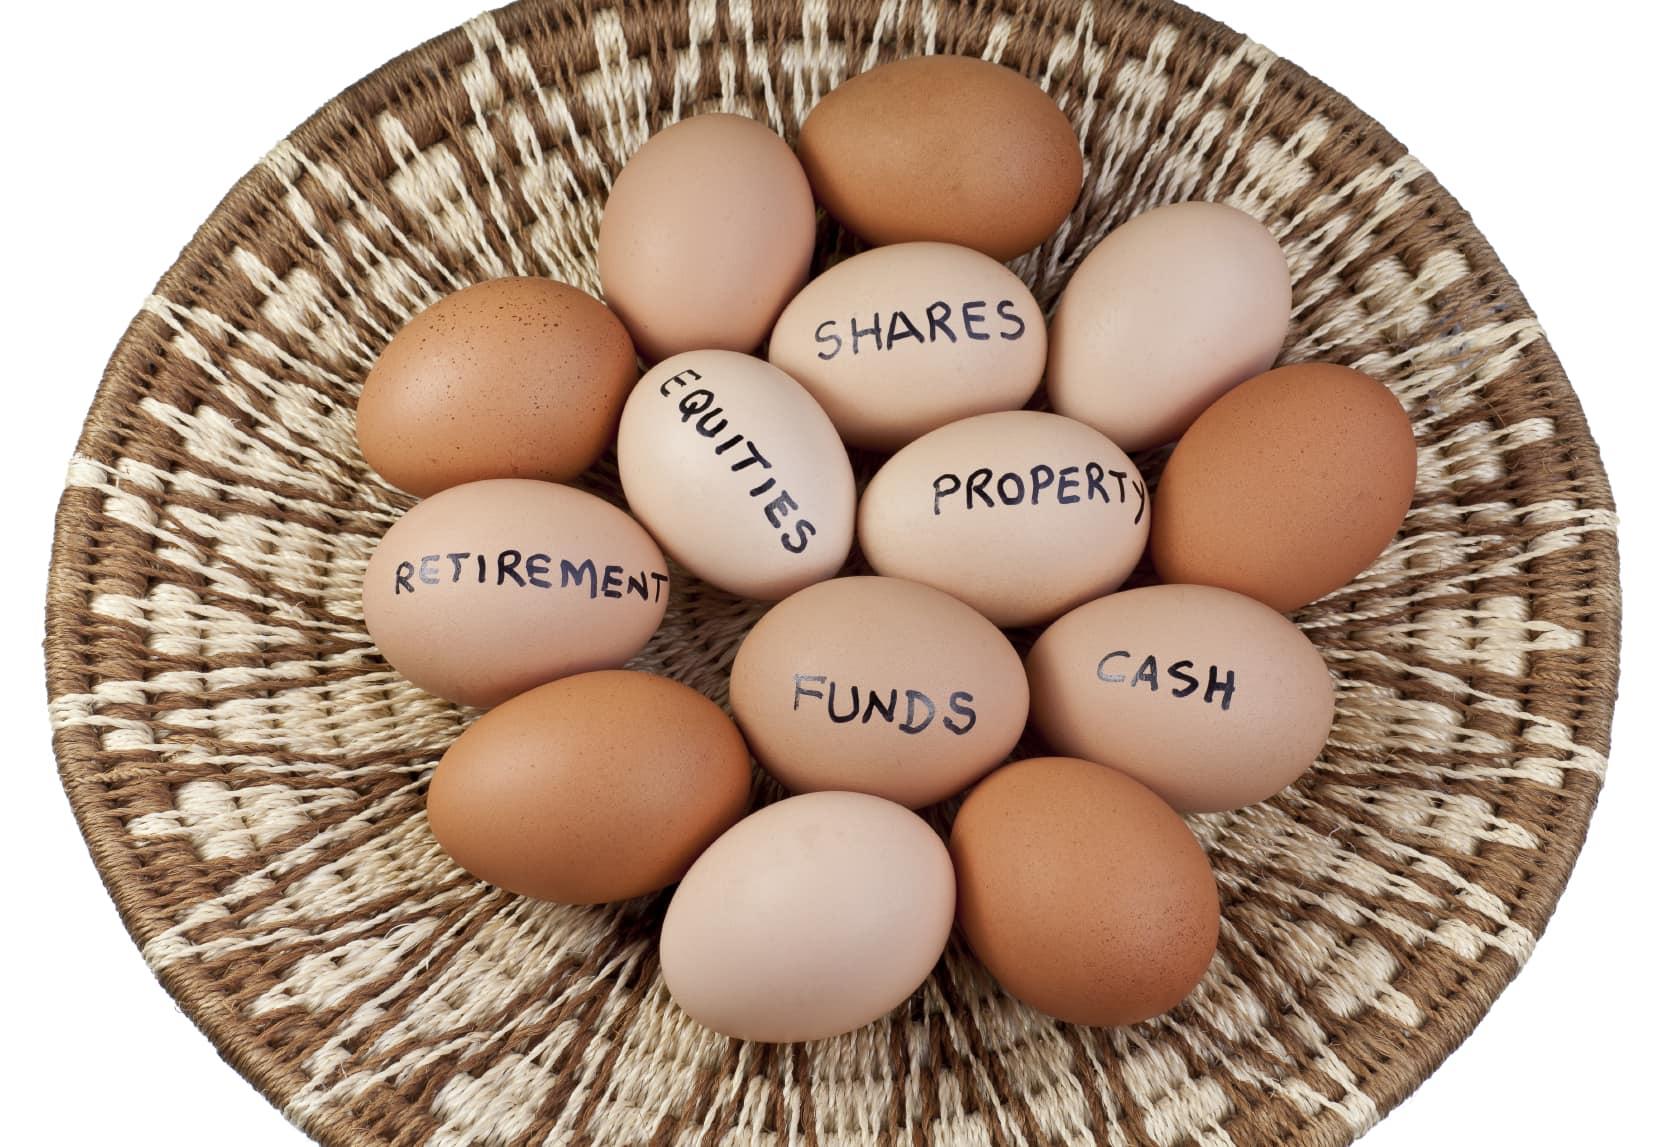 Four tactics to build an investment portfolio